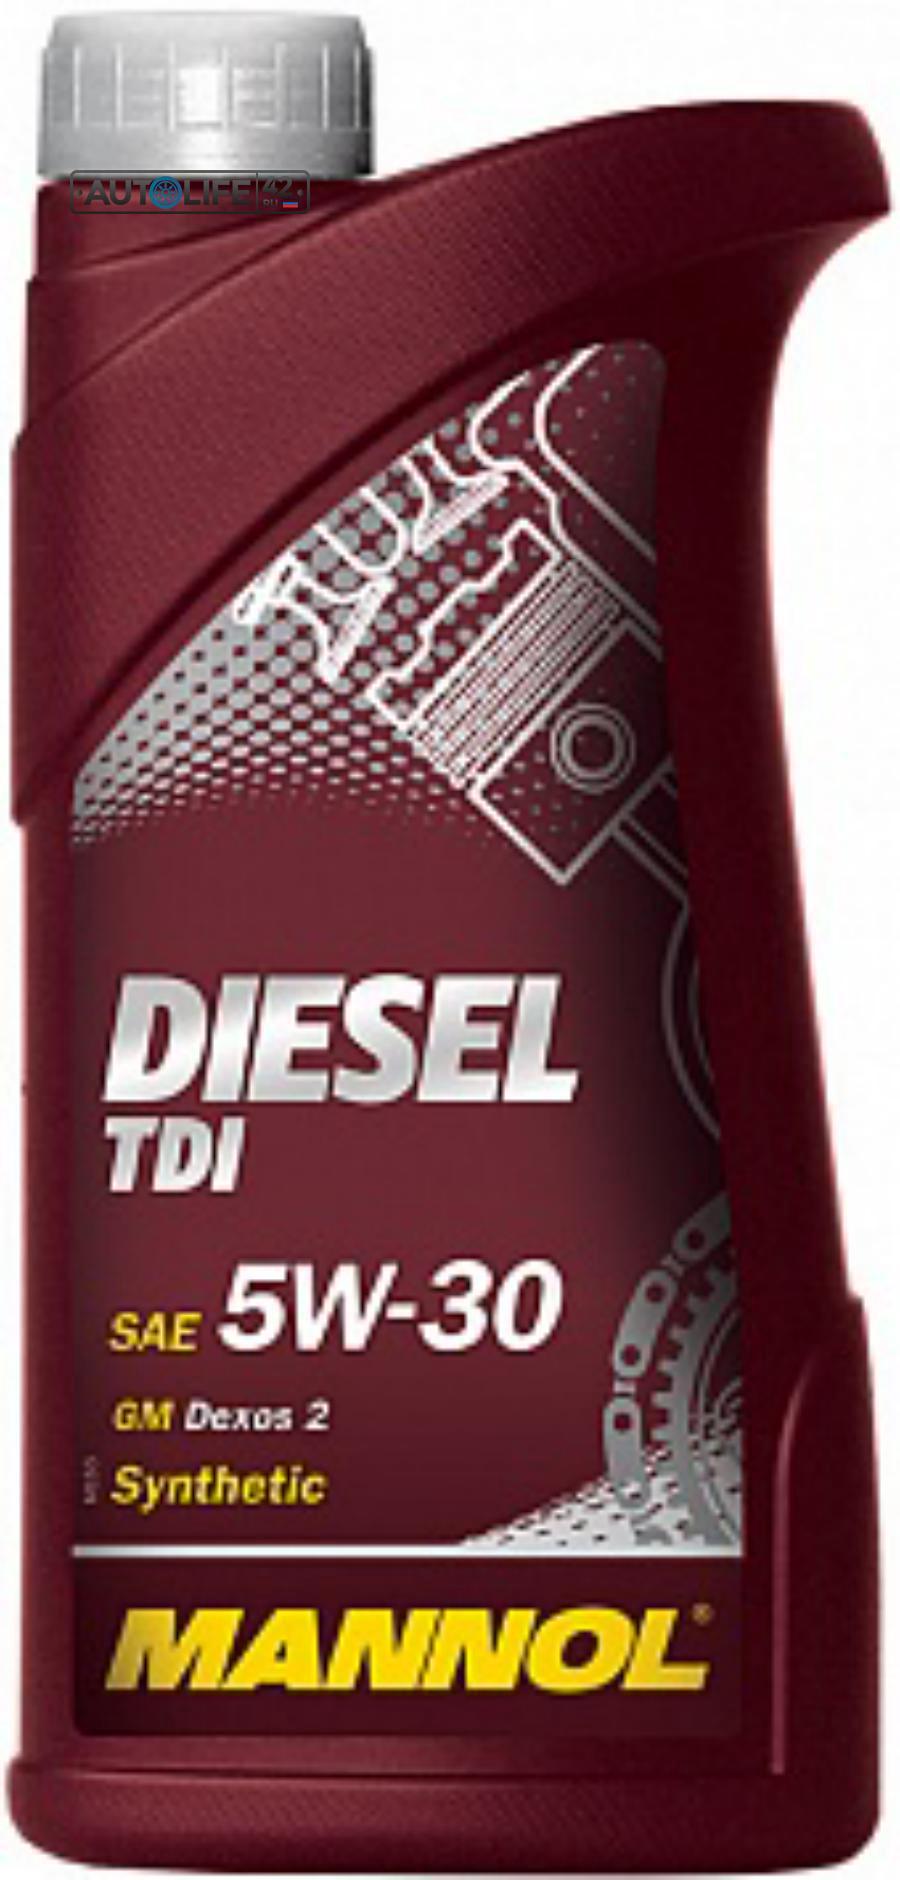 Масло моторное синтетическое Diesel TDI 5W-30, 1л